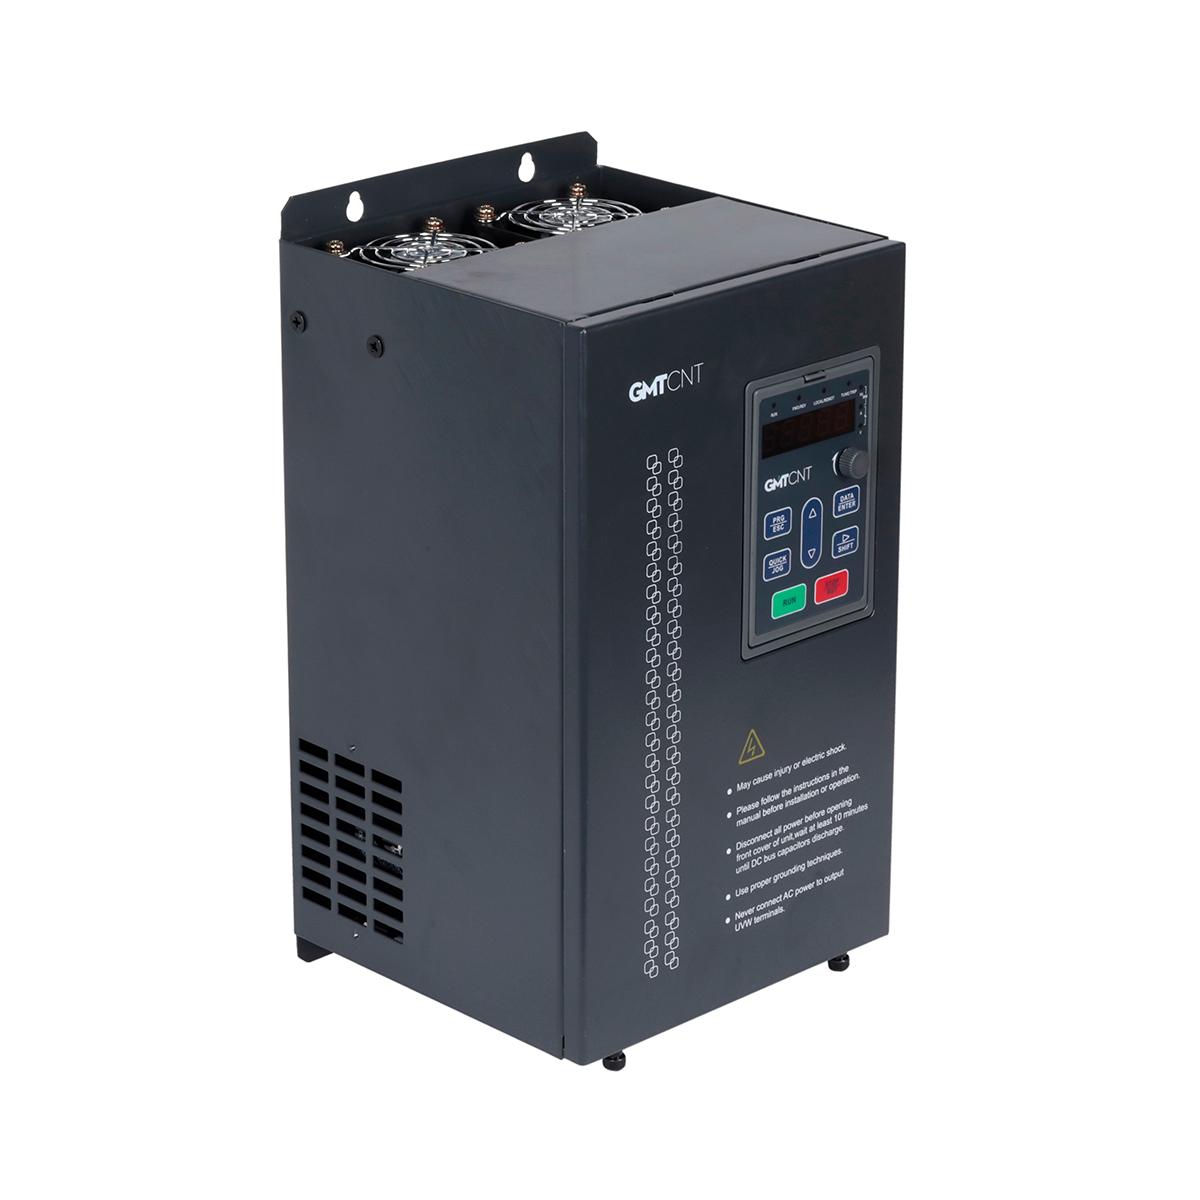 MICNO 0.75 kW~630 kW